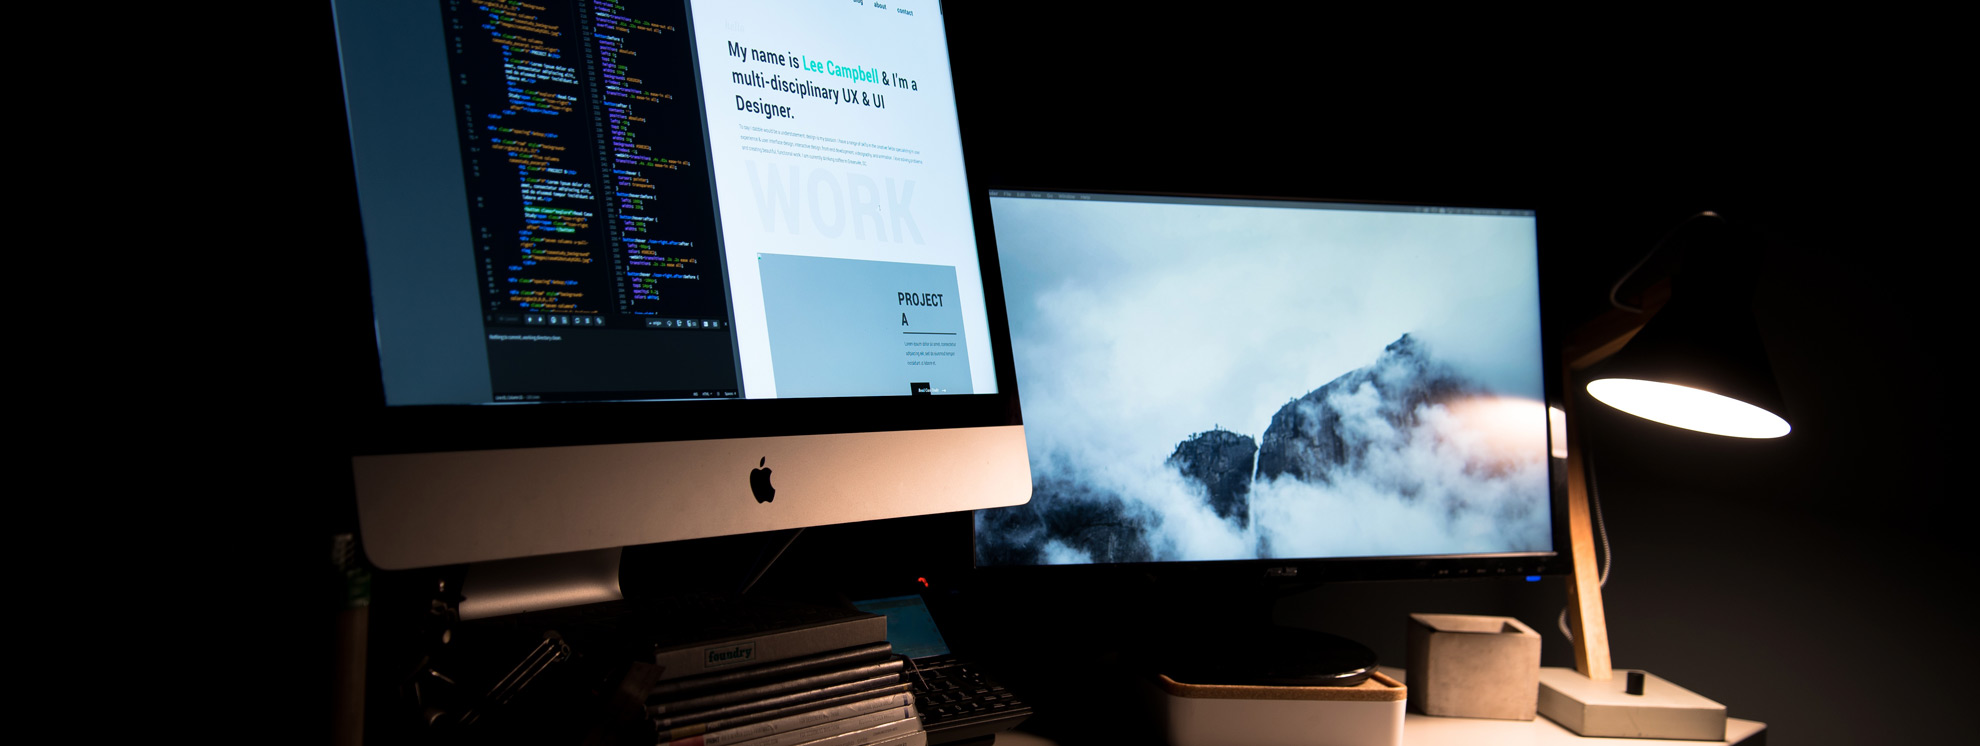 web-tasarim